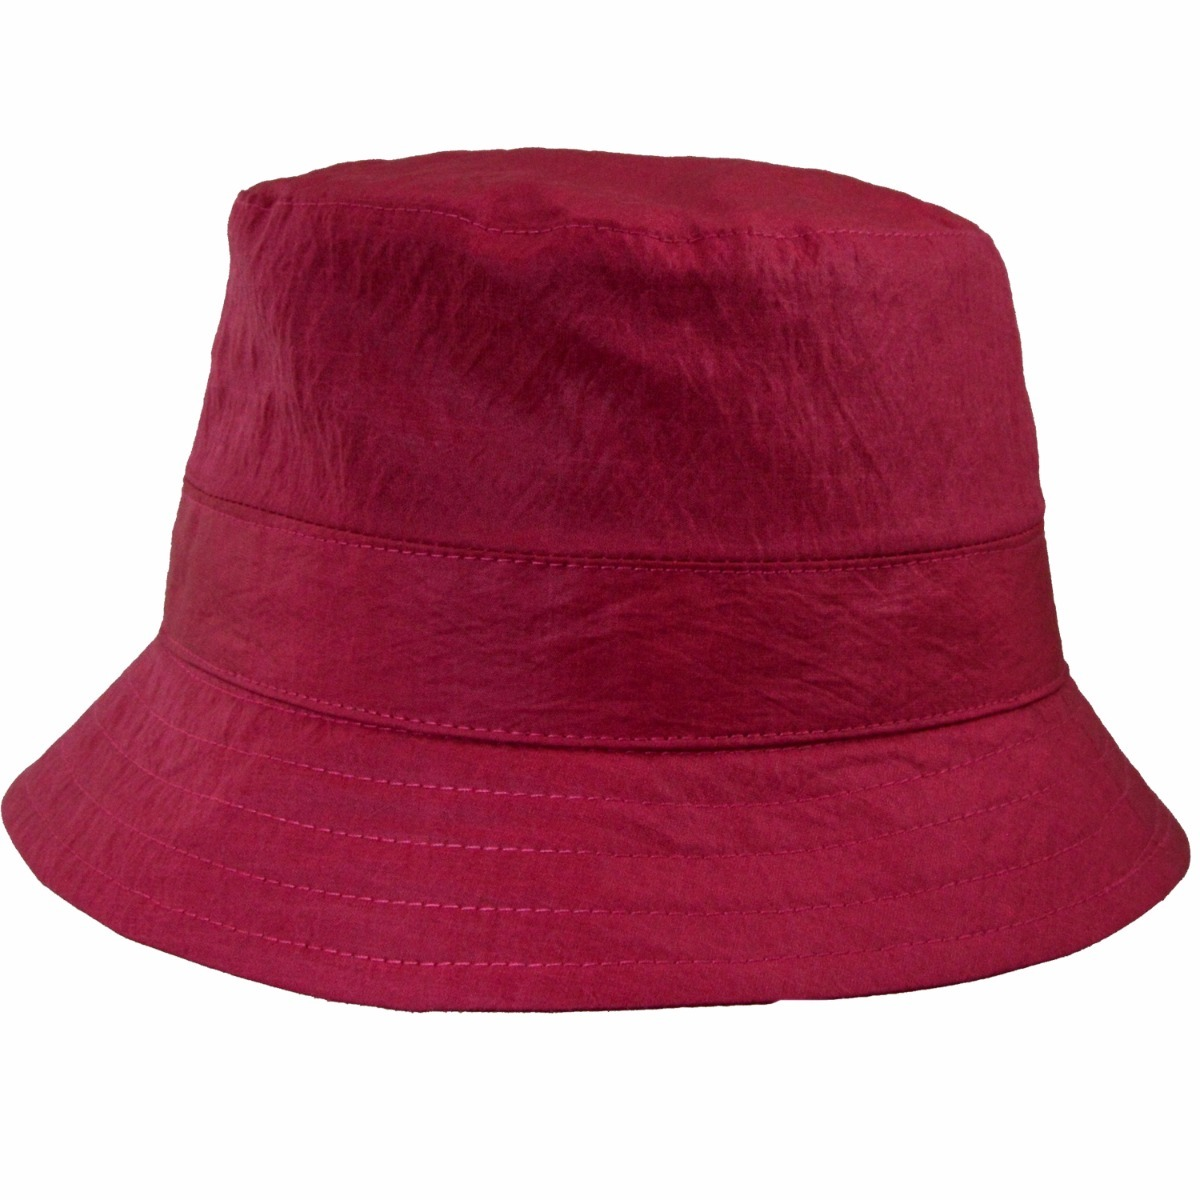 sombrero human sarge lluvia compañia de sombreros 71220293. Cargando zoom. 5fcb0de790e0